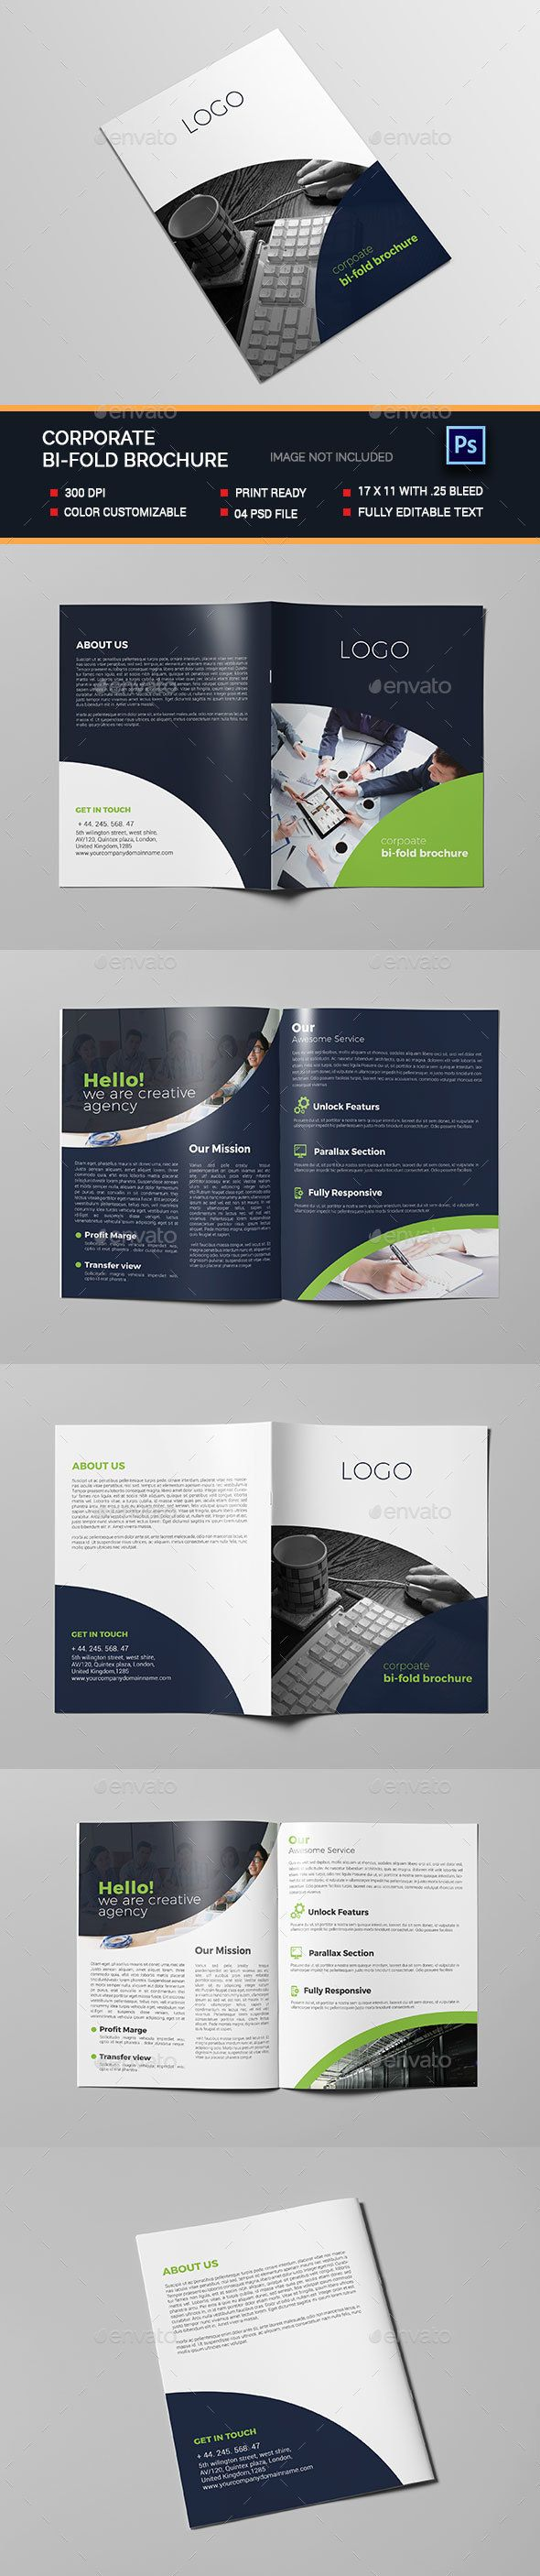 Corporate Bi-fold Brochure Template PSD. Download here: https://graphicriver.net/item/corporate-bifold-brochure/17381464?ref=ksioks